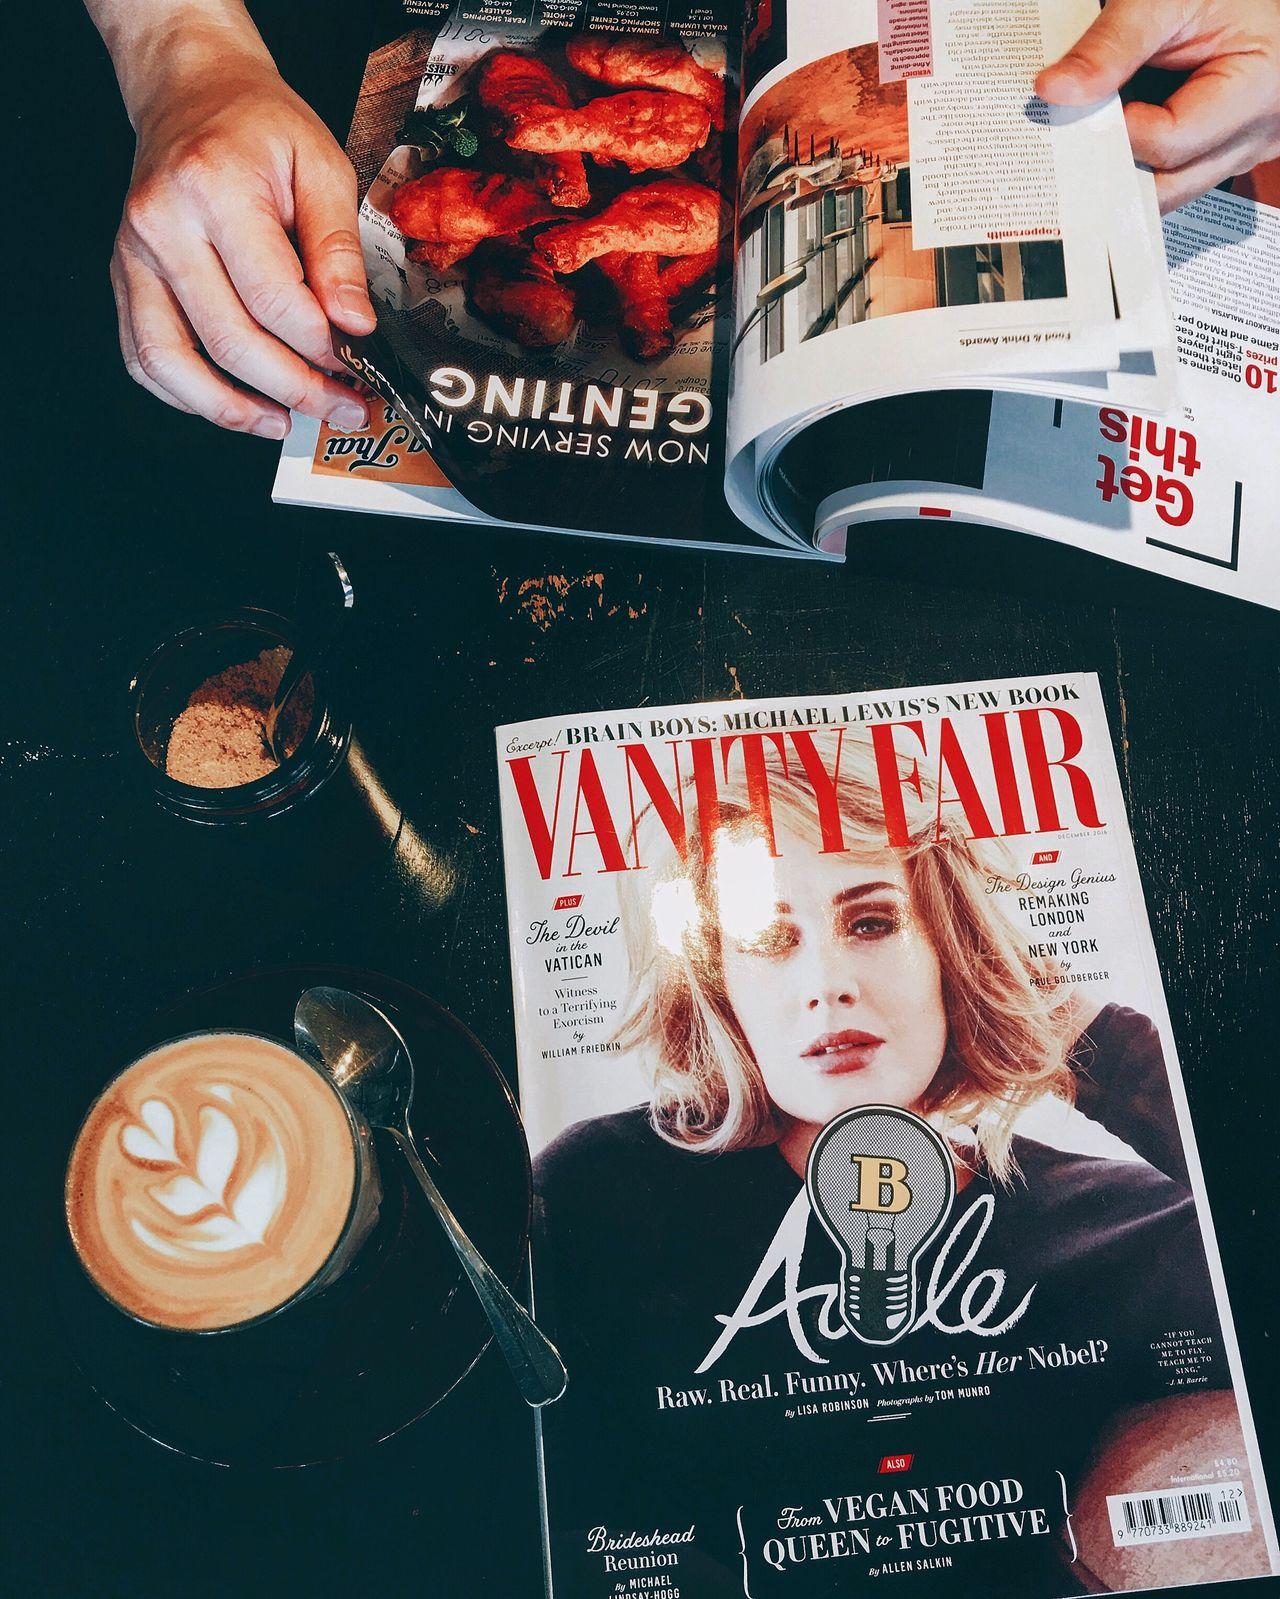 Coffee Coffee Time Coffee Break On My Table Onmytable Coffee ☕ Coffee Shop Coffeetime Latte Latte Art